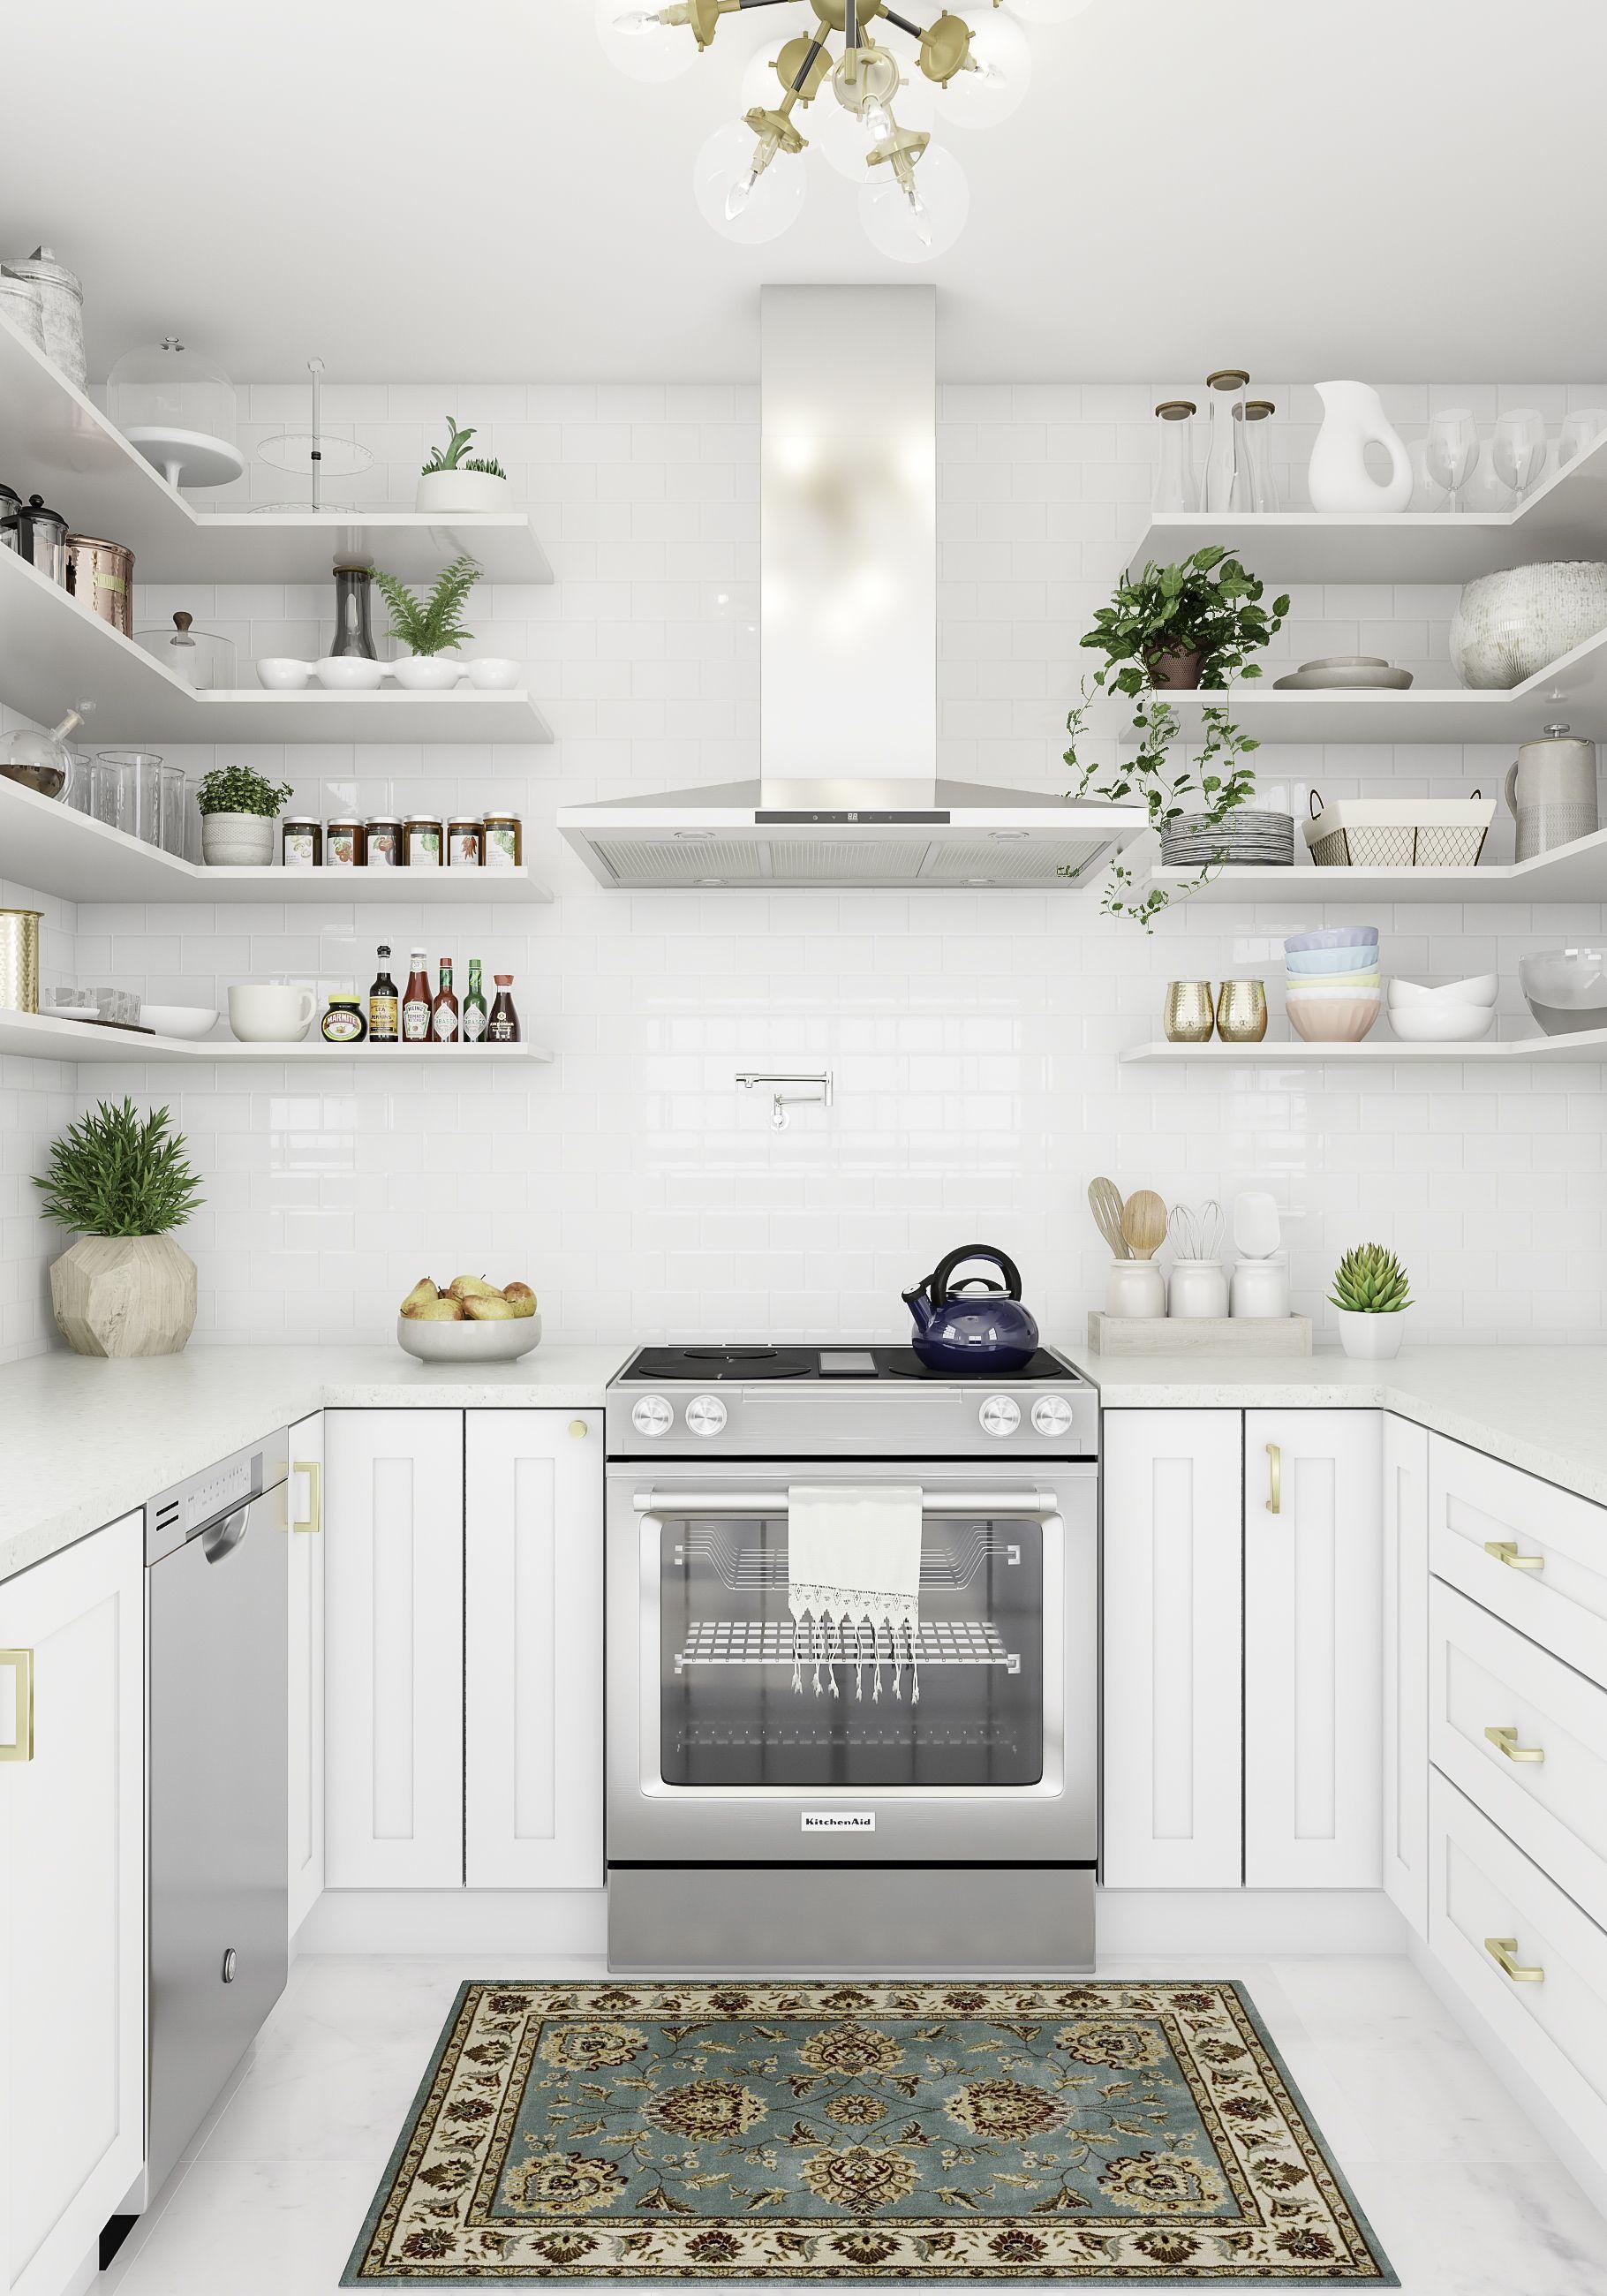 Pin On Kitchen Decoration Design